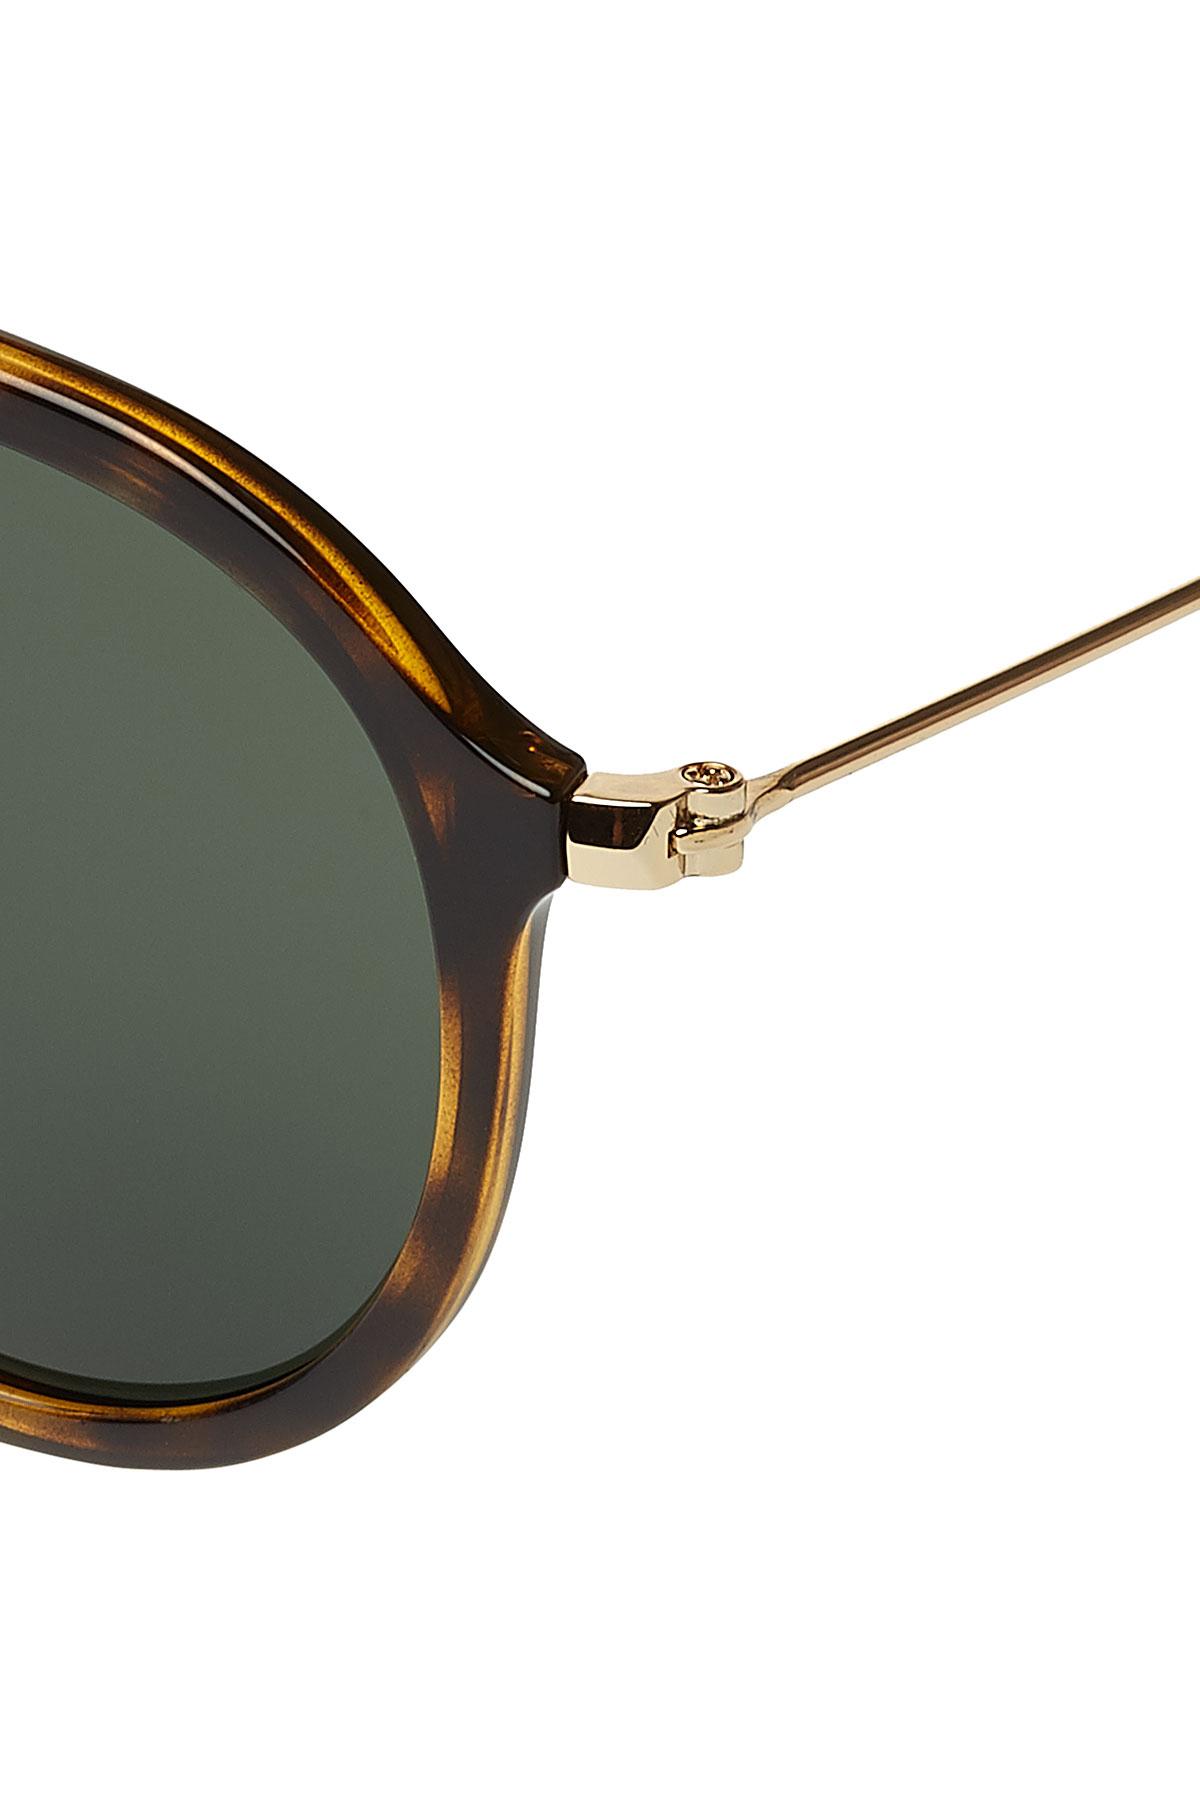 Ray Ban Glasses Frames Tortoise Shell : Ray-ban Tortoise Shell Aviator Sunglasses - Brown in Brown ...